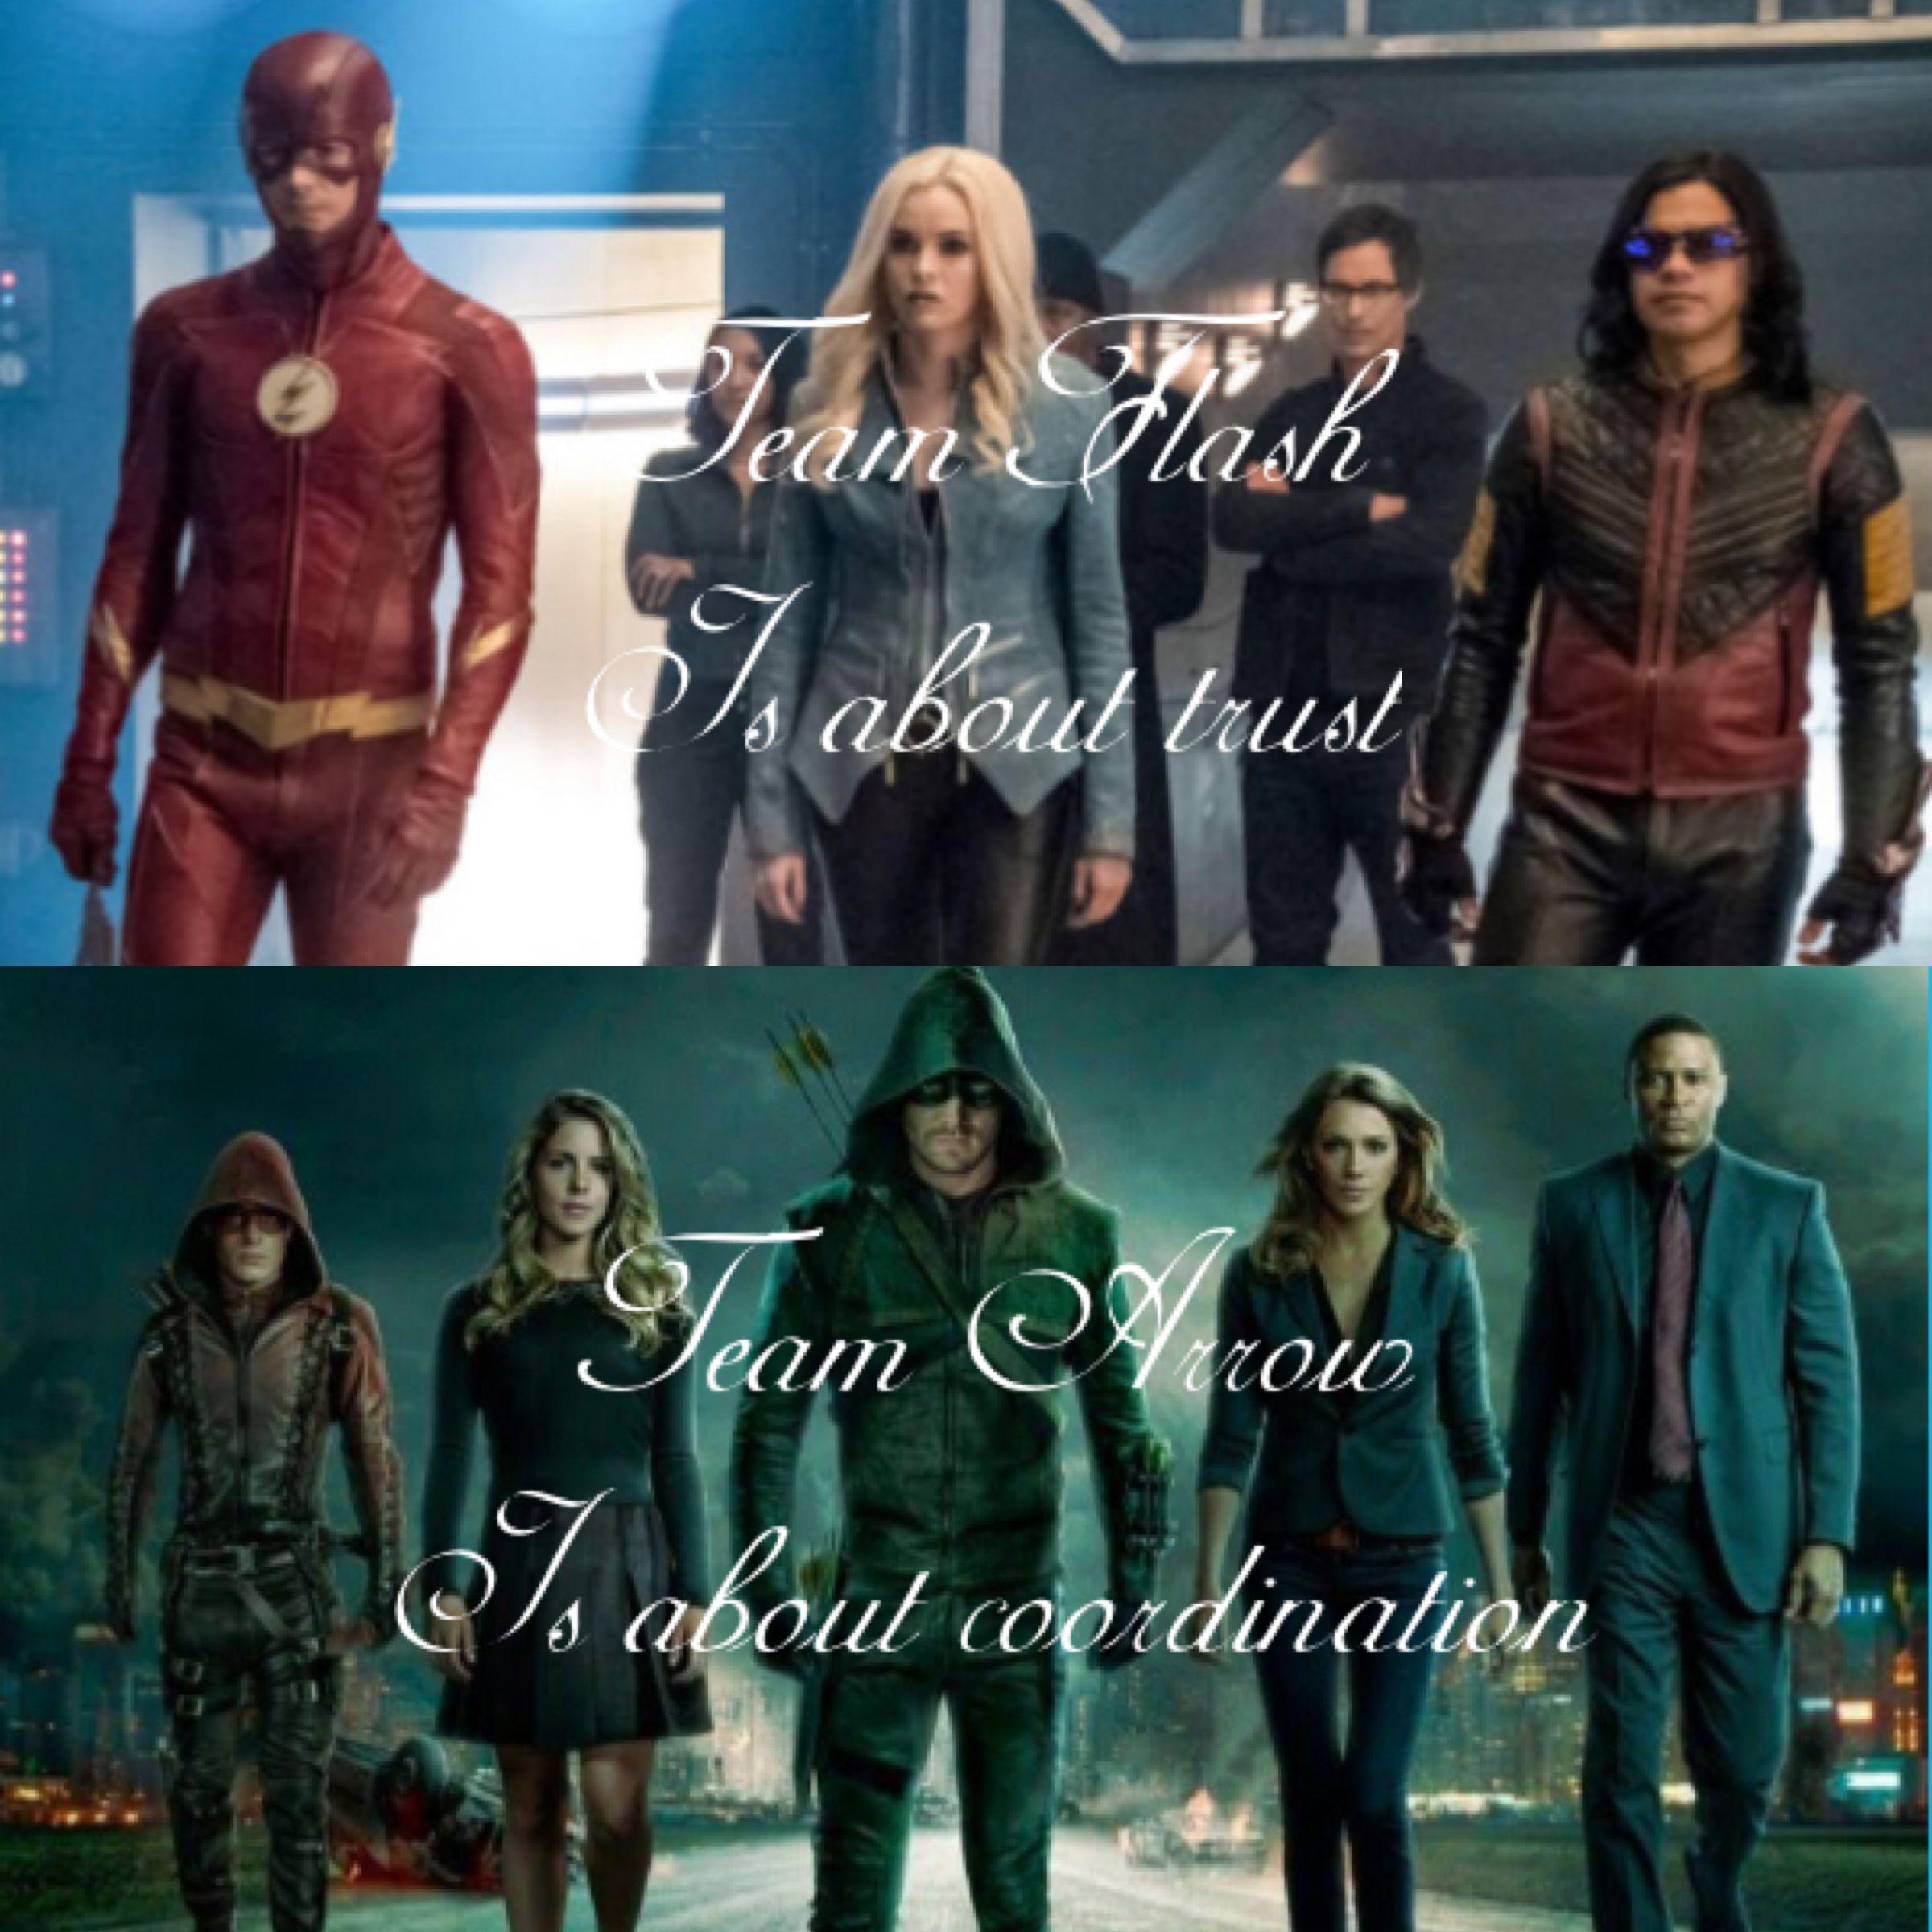 Team Flash Or Team Arrow Arrow Flash Oliverqueen Barryallen